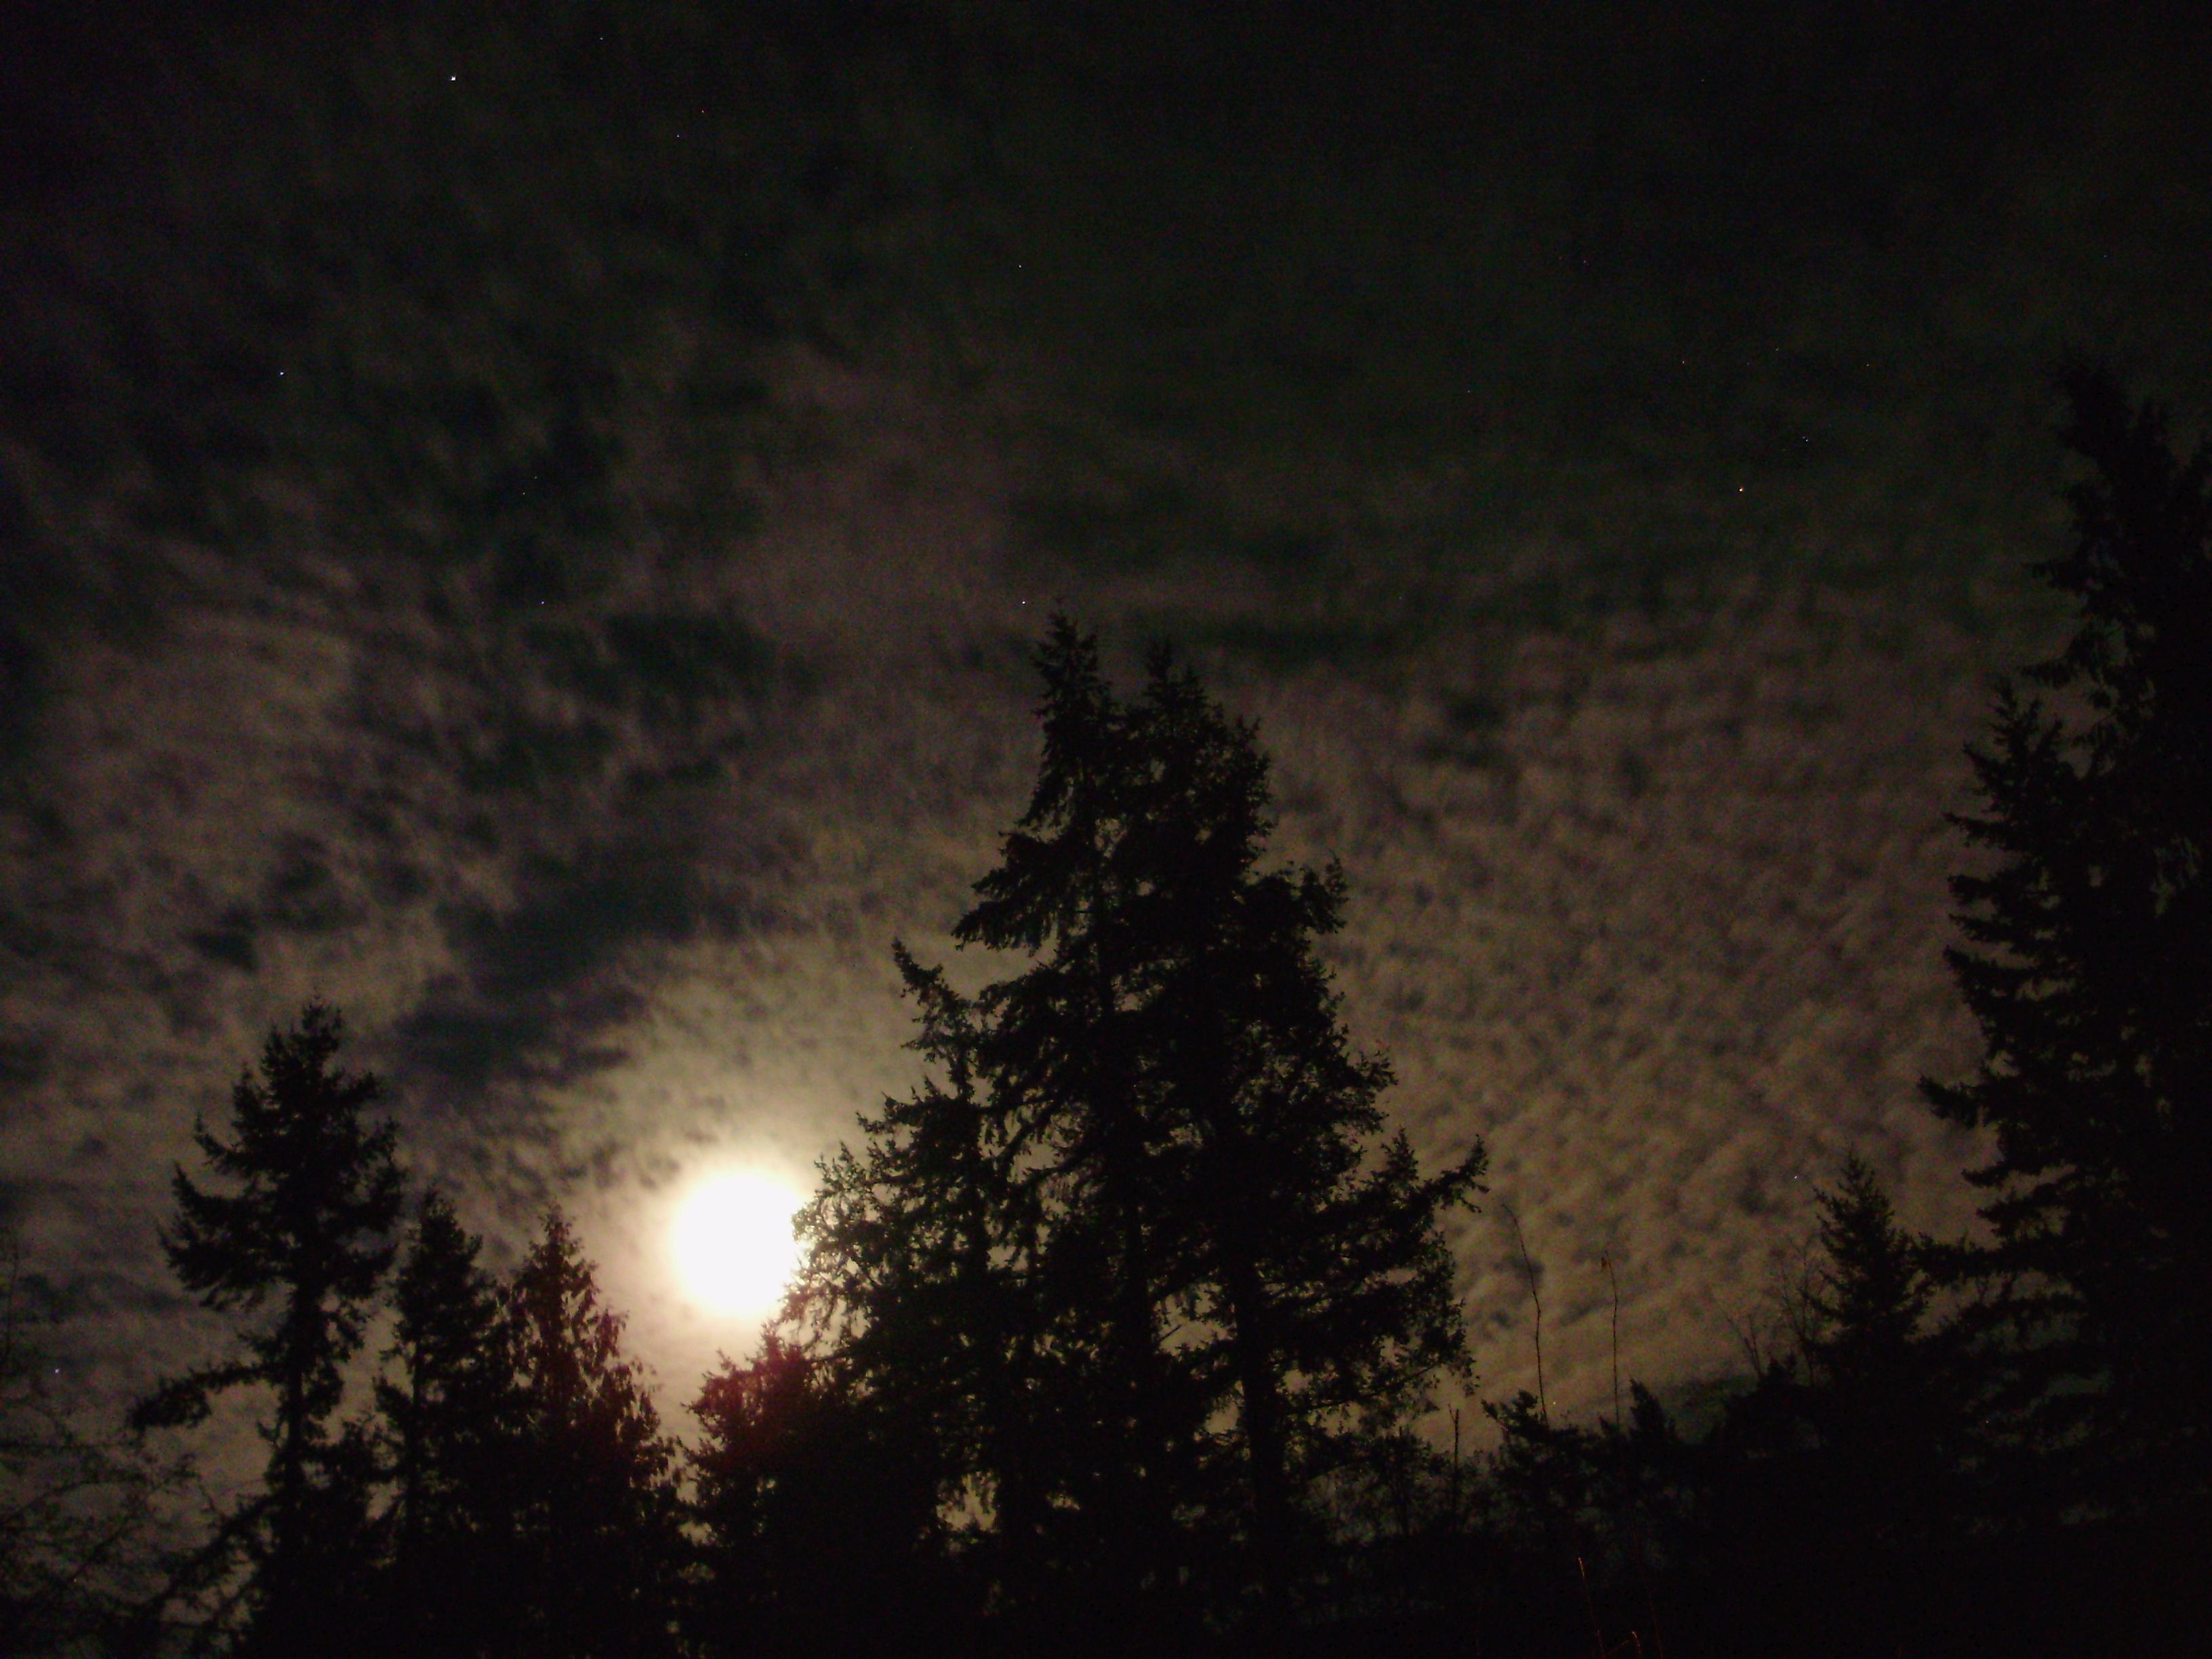 Nighttime_cirrocumulus